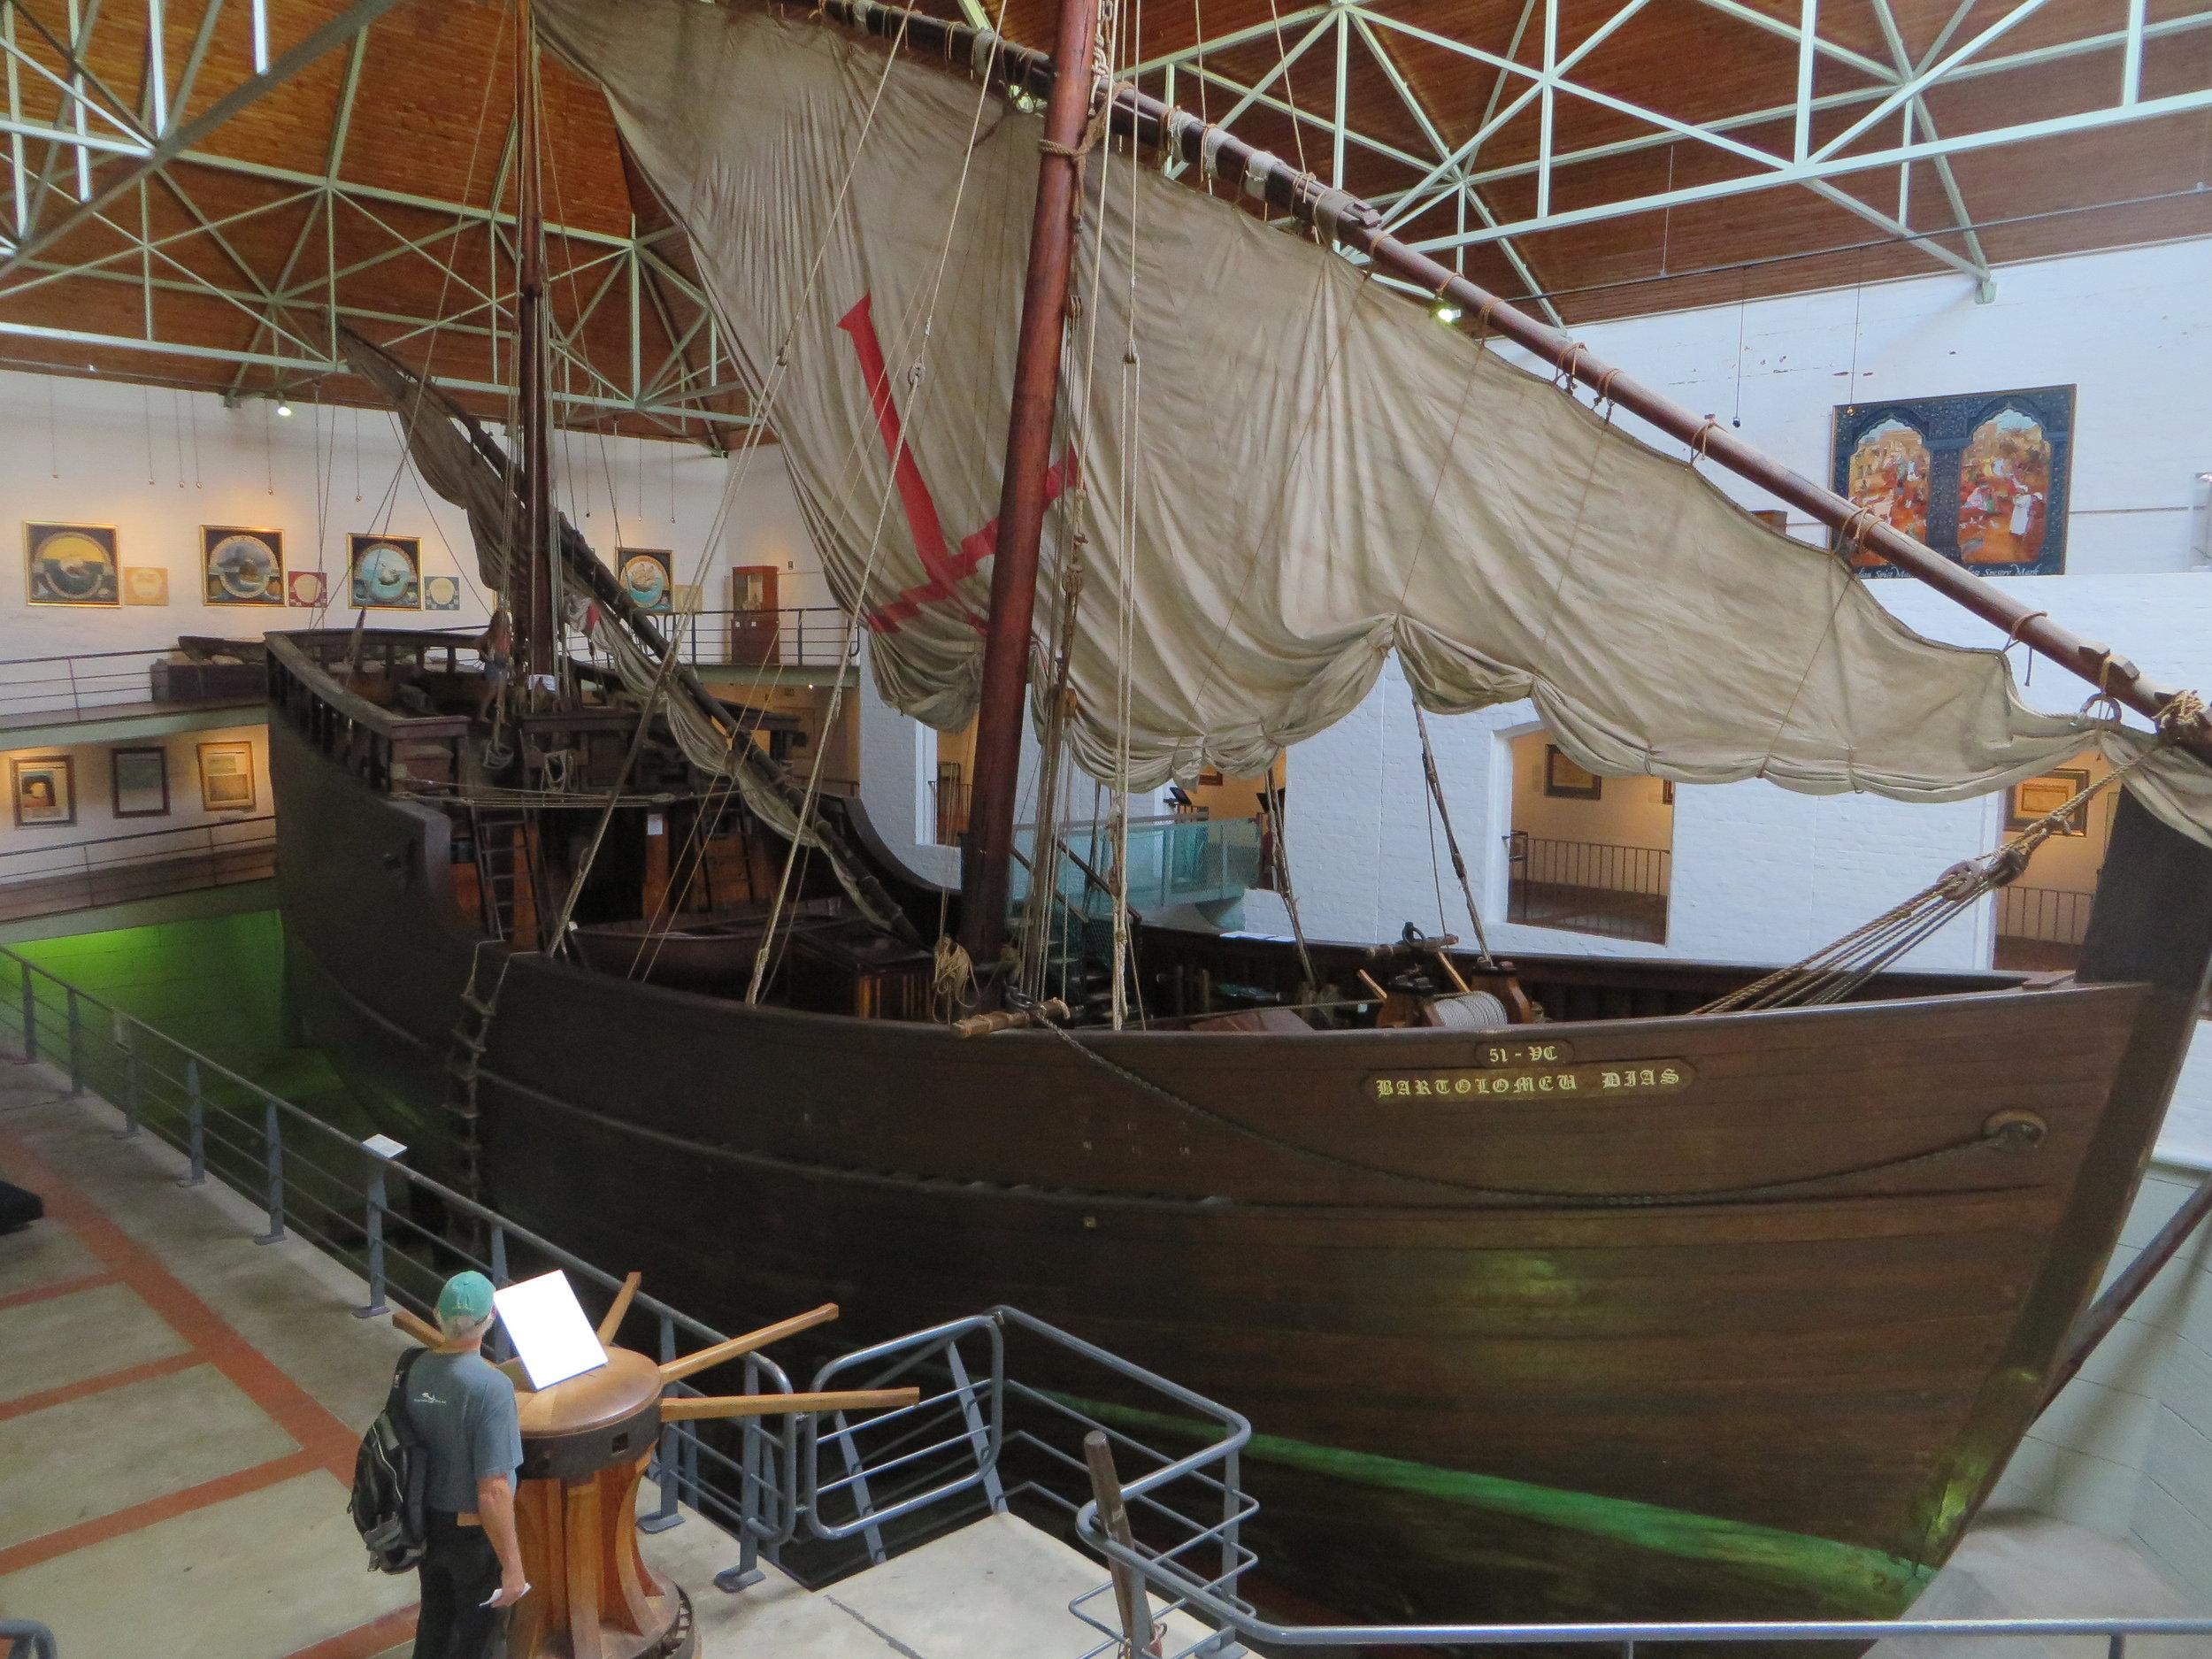 A full size replica of Bartolomew Dias' caravel on display at the Dias Museum